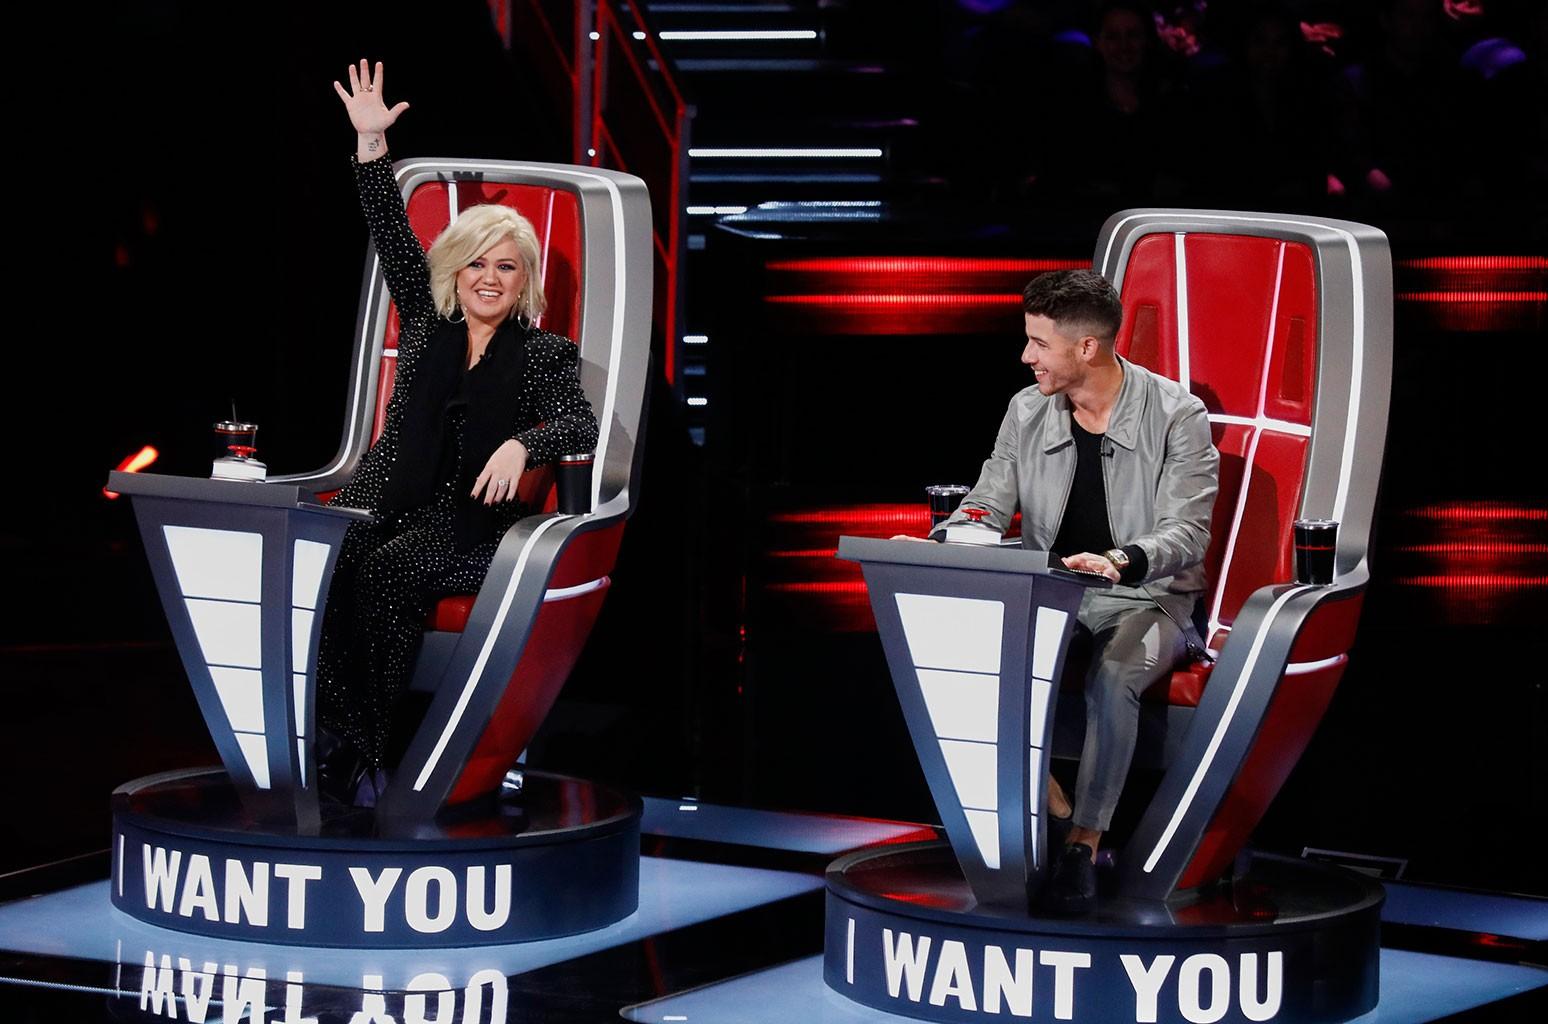 Kelly Clarkson and Nick Jonas